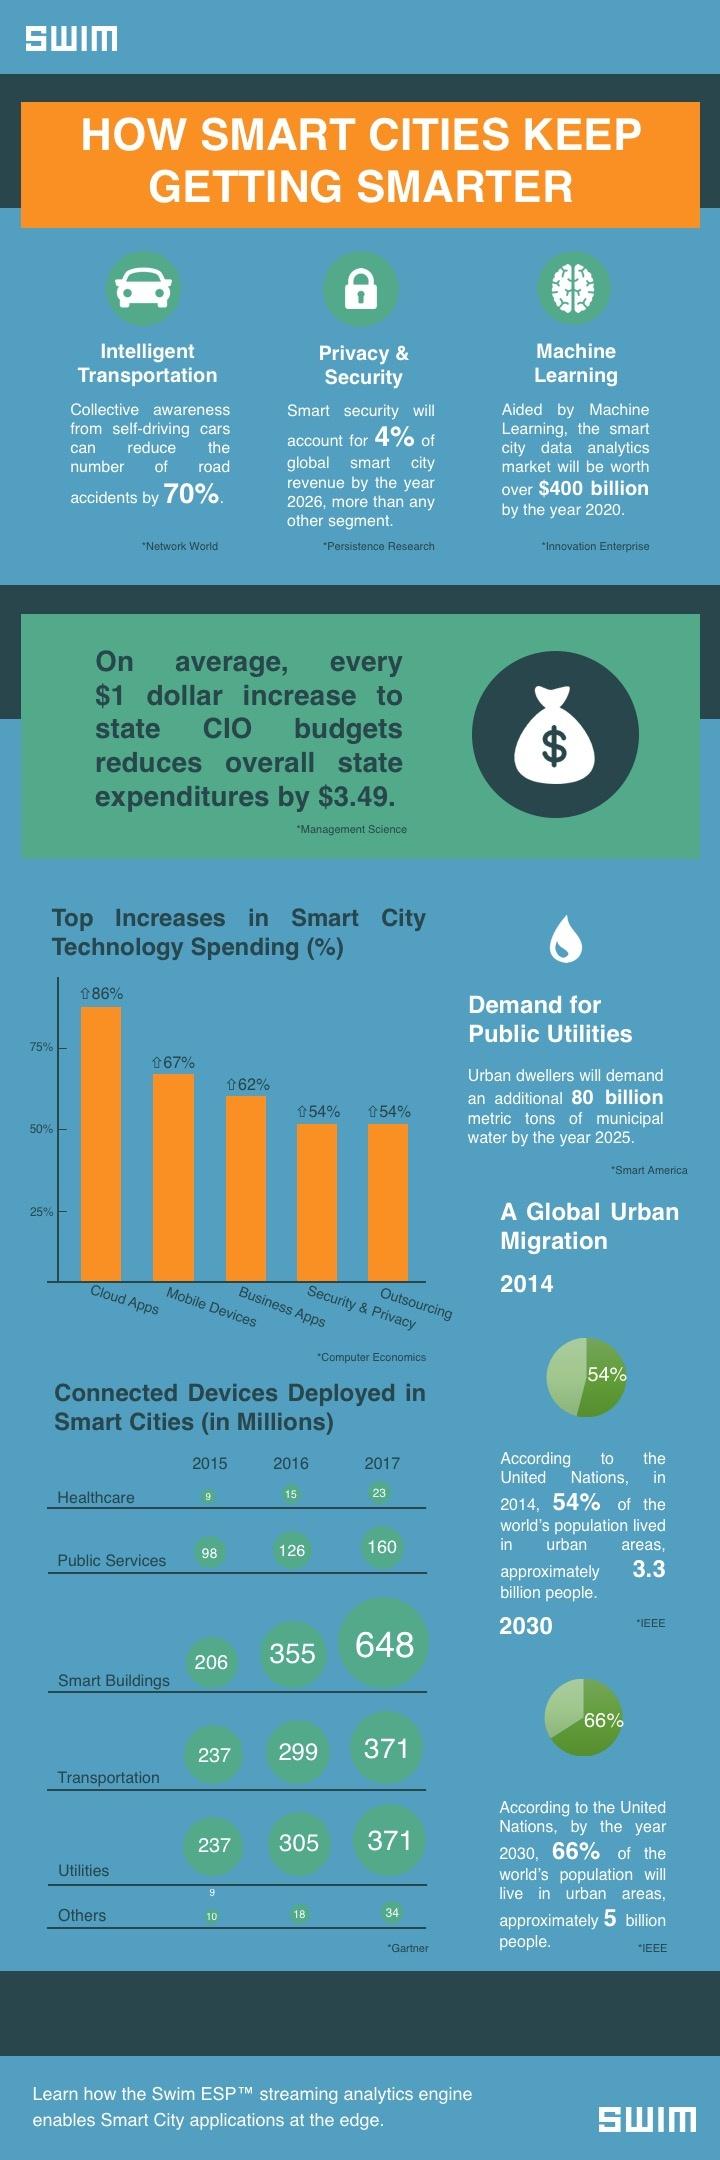 How Smart Cites Keep On Getting Smarter (Smart City Infographic) | Swim Inc.